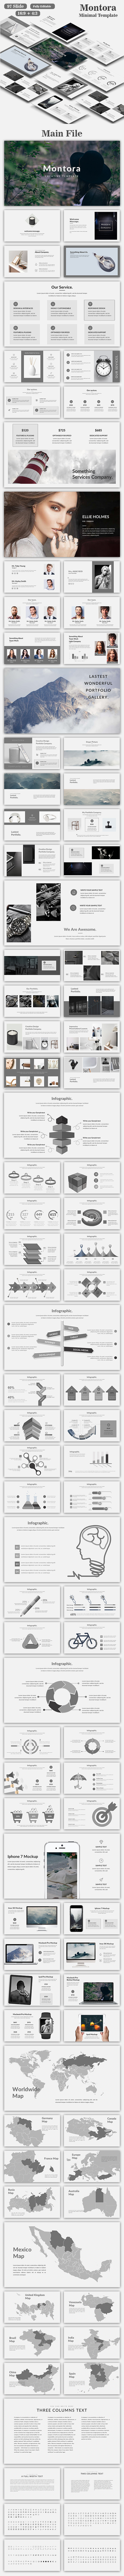 Montora Minimal Keynote Template - Creative Keynote Templates